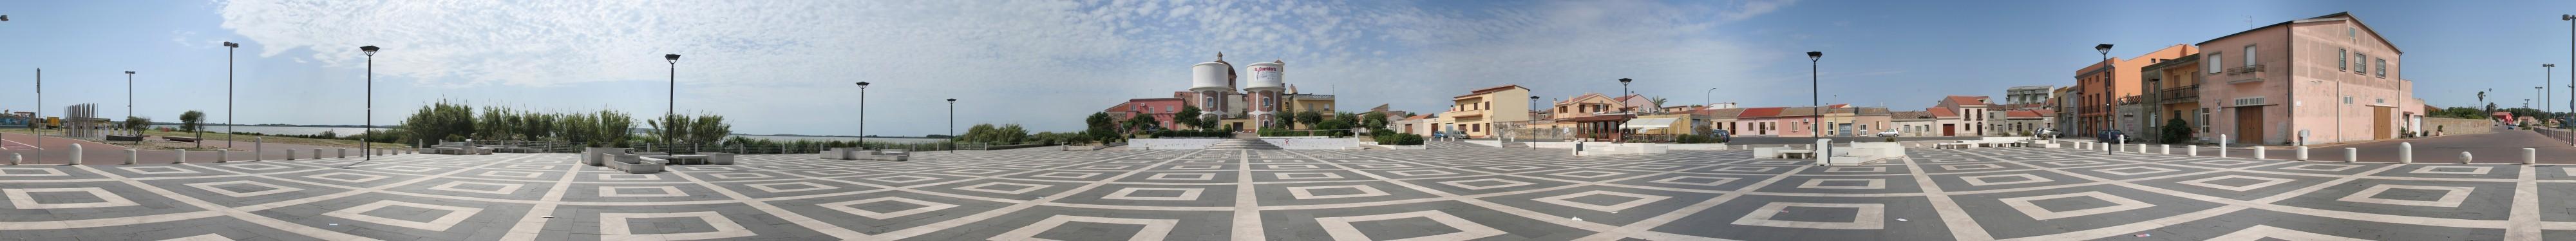 2013-06-08 - Panoramica Cabras - Piazza Stagno- Panorama - copyr (Custom)